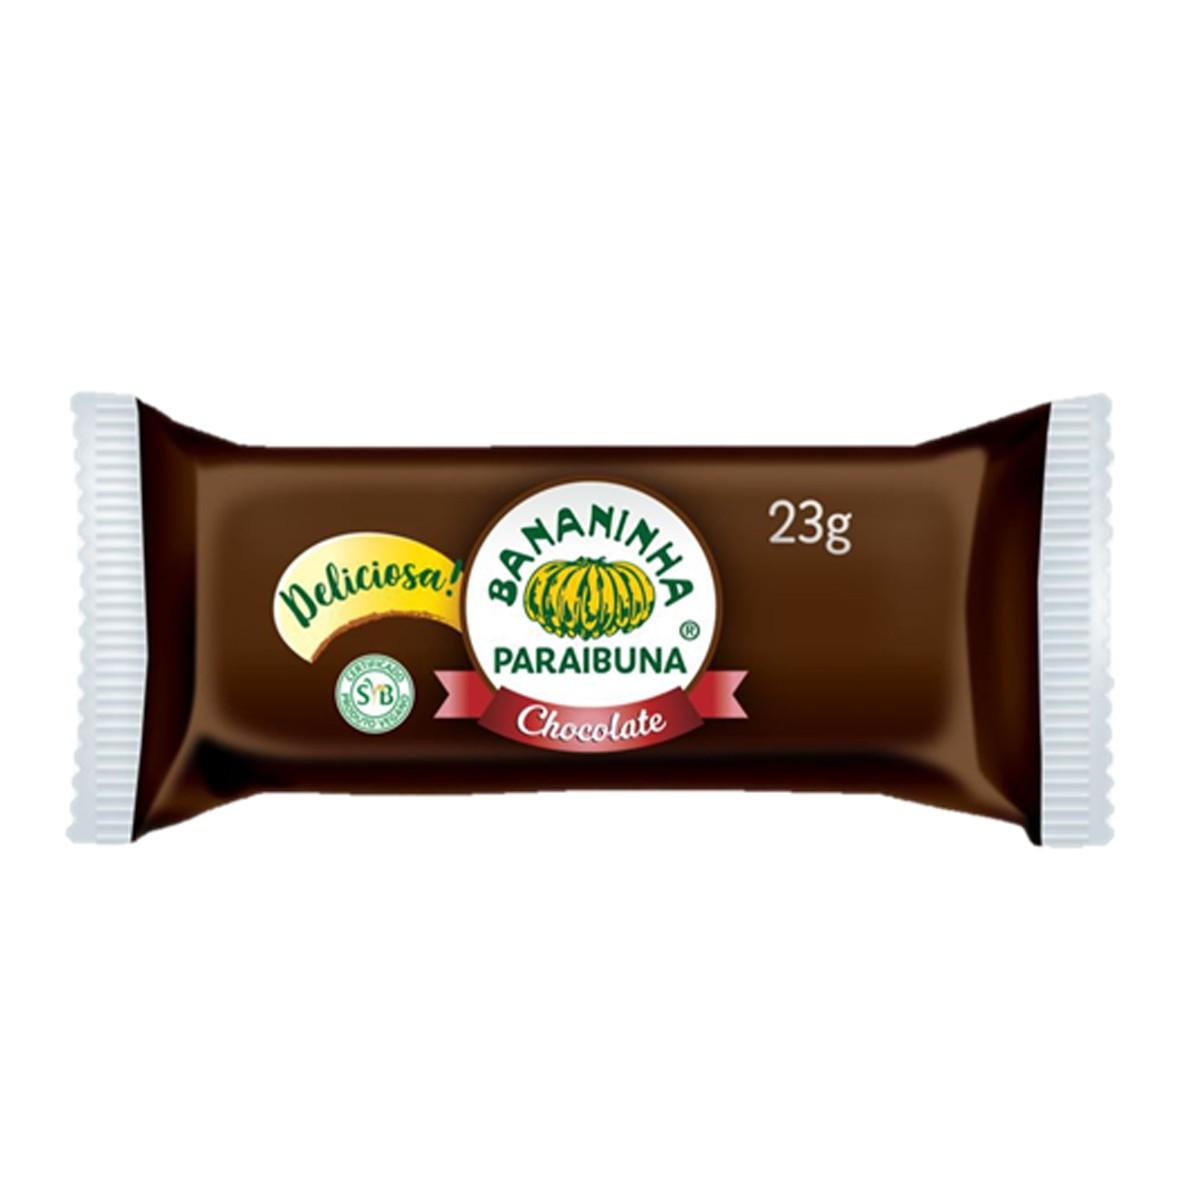 Bananinha com Chocolate 23g - Bananinha Paraibuna